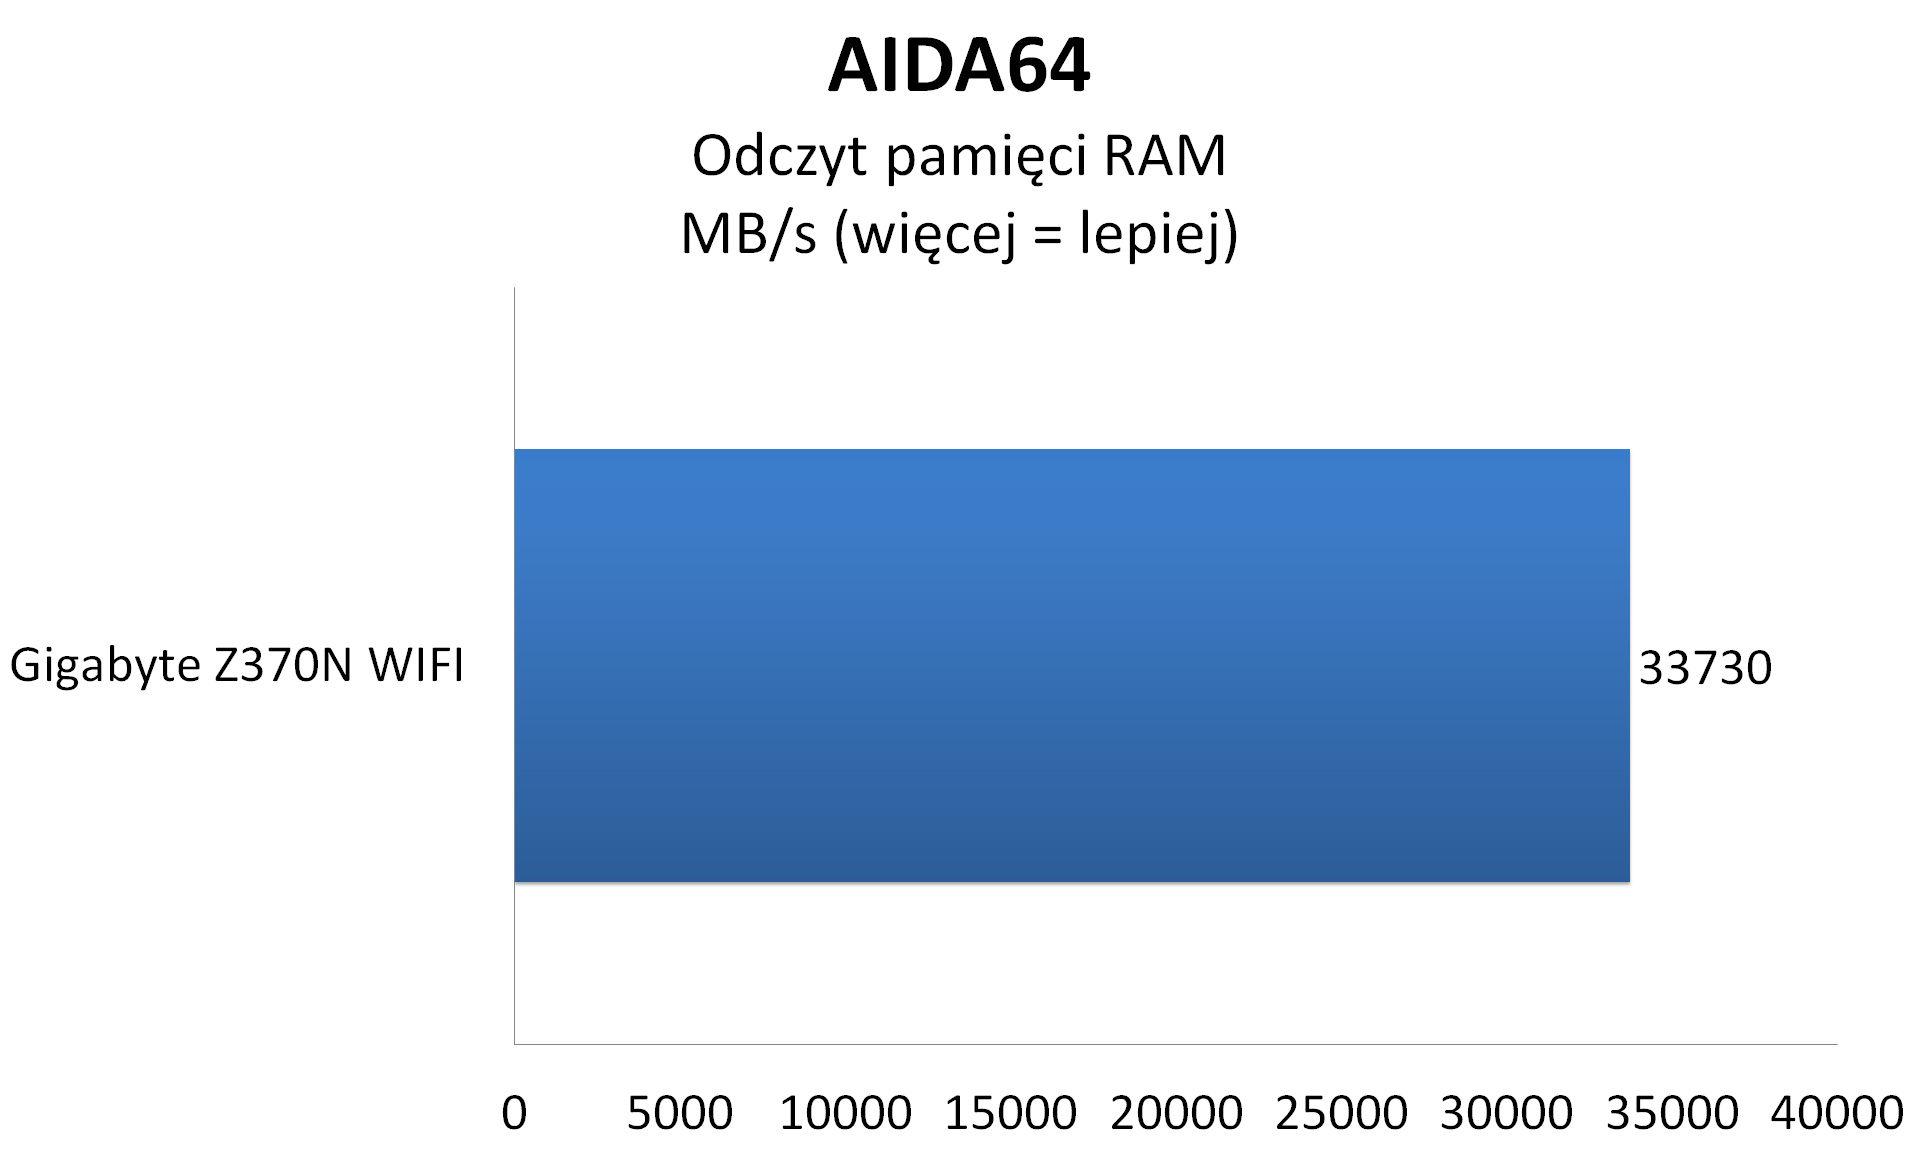 GIGABYTE Z370N WIFI - wykresy